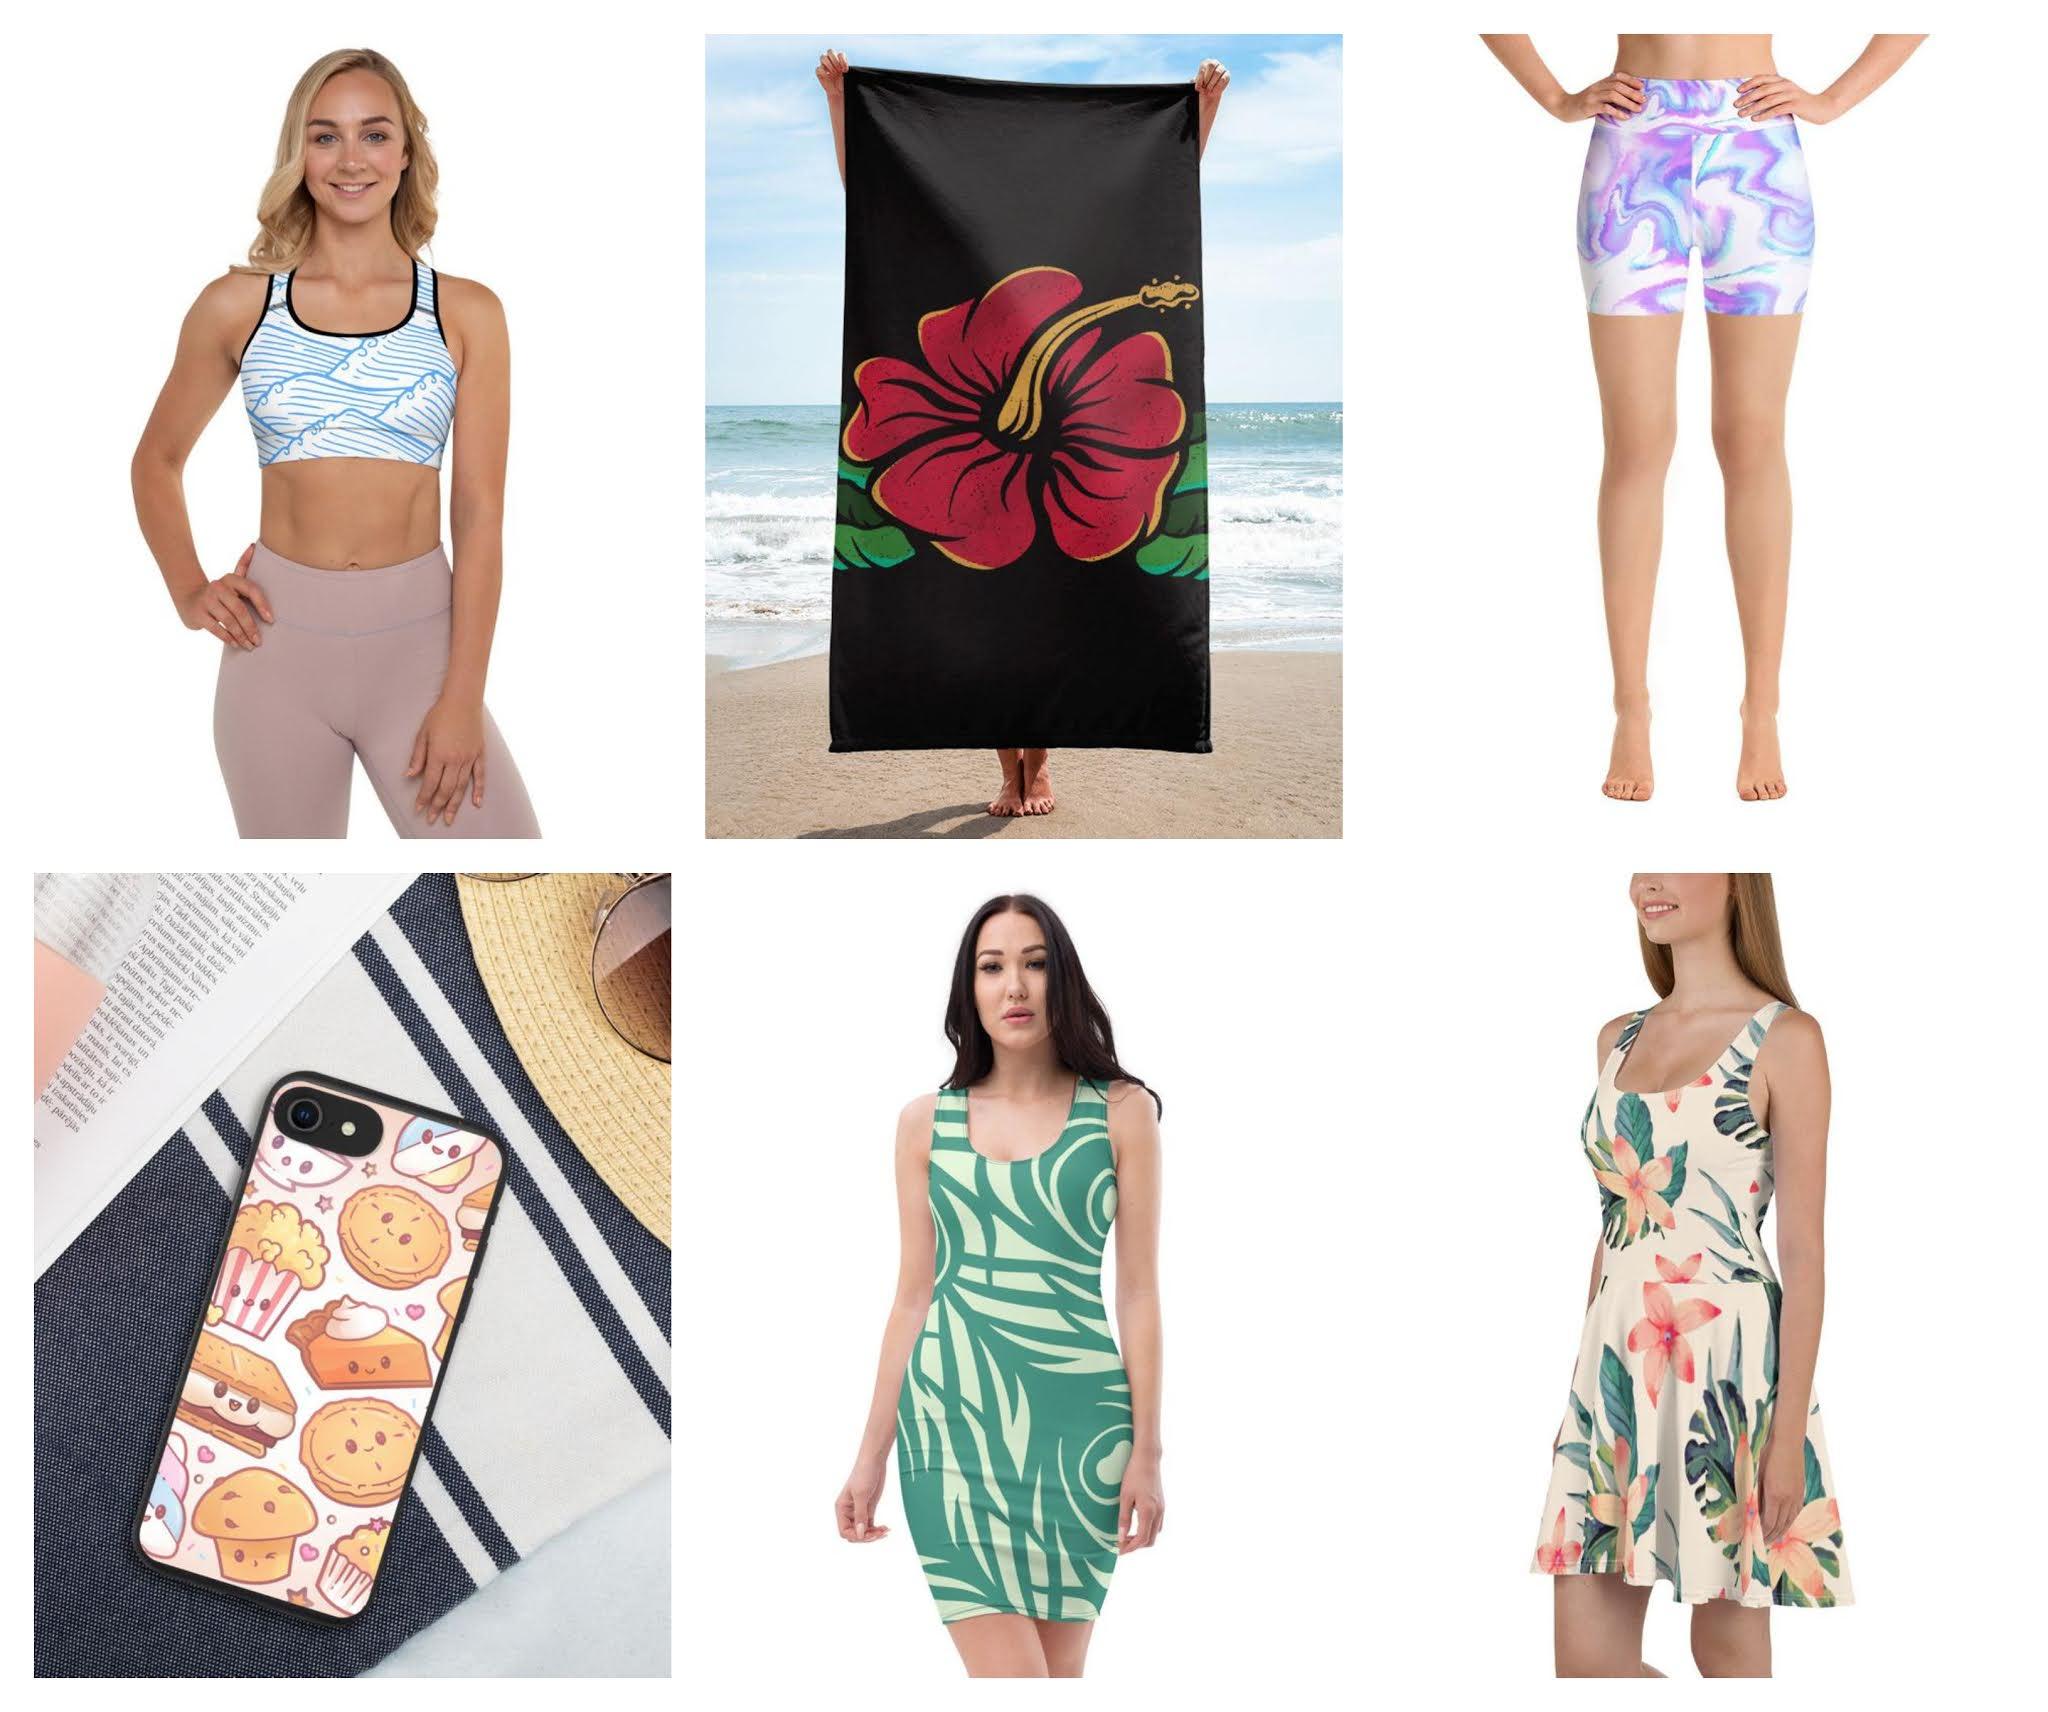 Trendy 2021 Swimwear and clothing